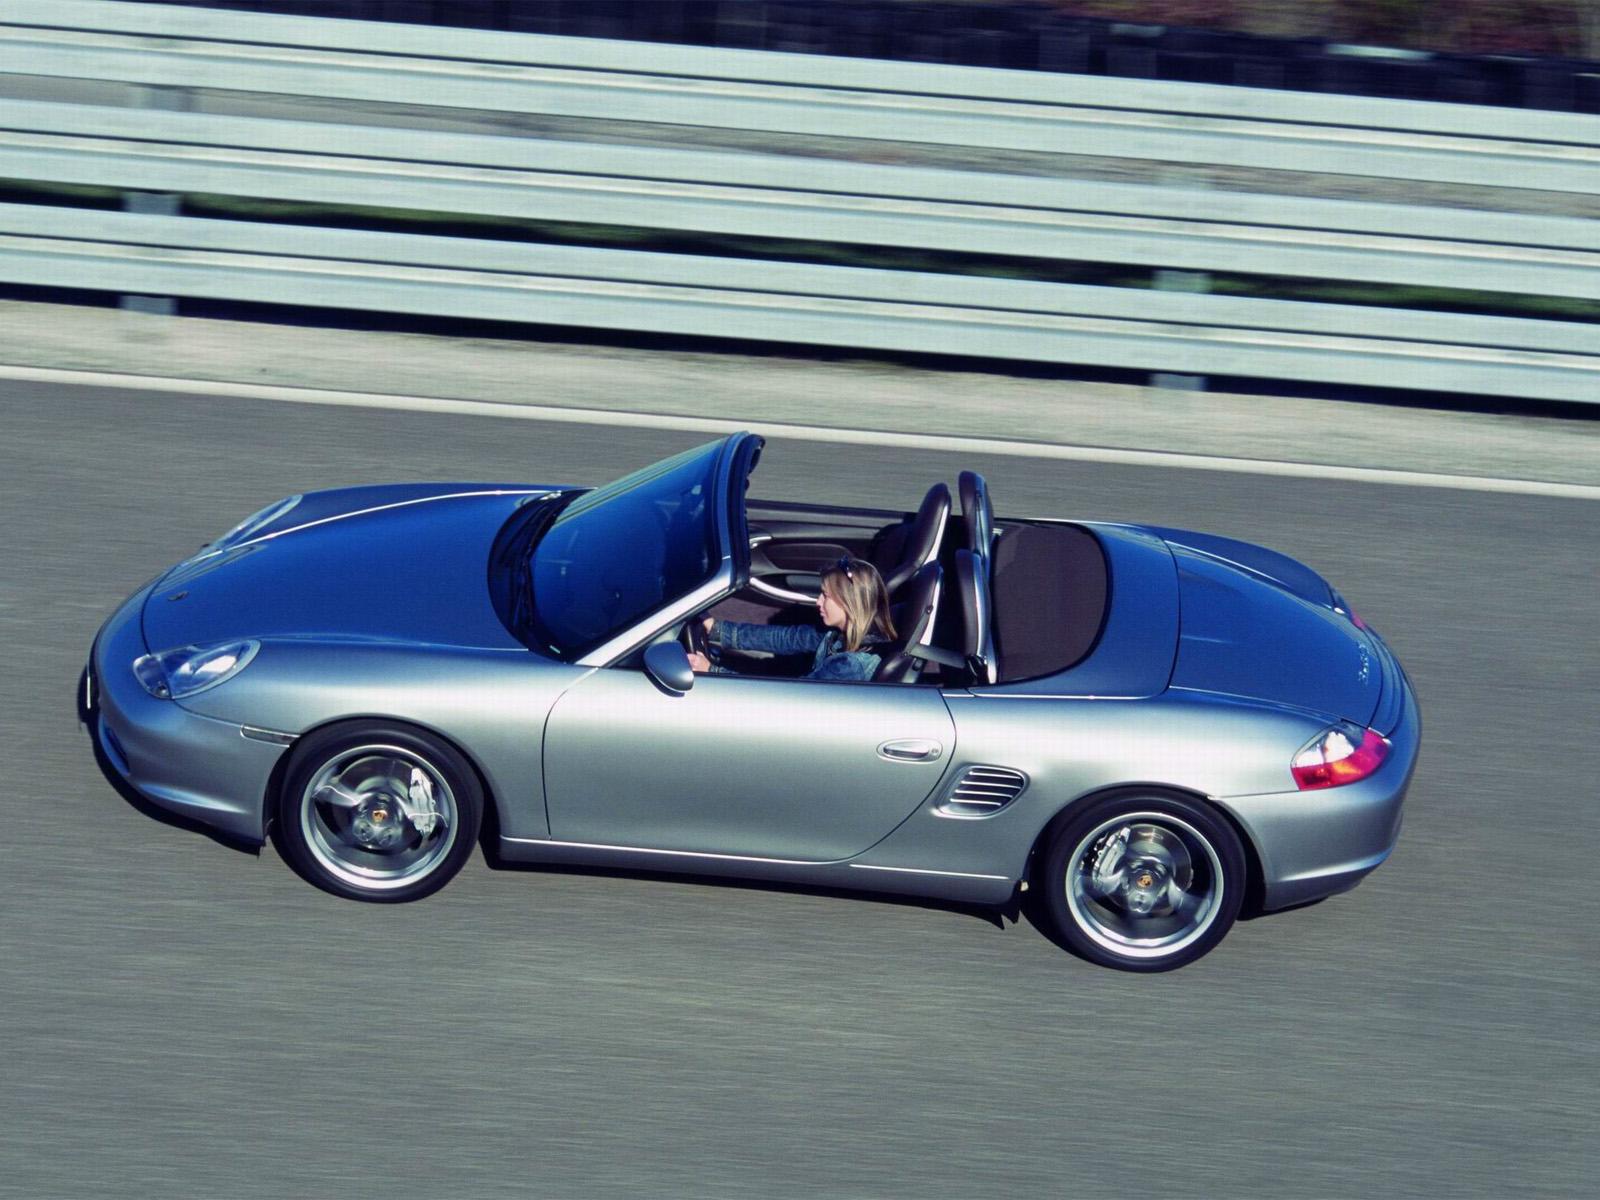 http://4.bp.blogspot.com/-OfIB-DJXvSw/T46hIclj-lI/AAAAAAAA2OQ/-uz6WGMsC4o/s1600/Porsche+Boxster+S+Special+Edition+Cars+Wallpapers+(1).jpg